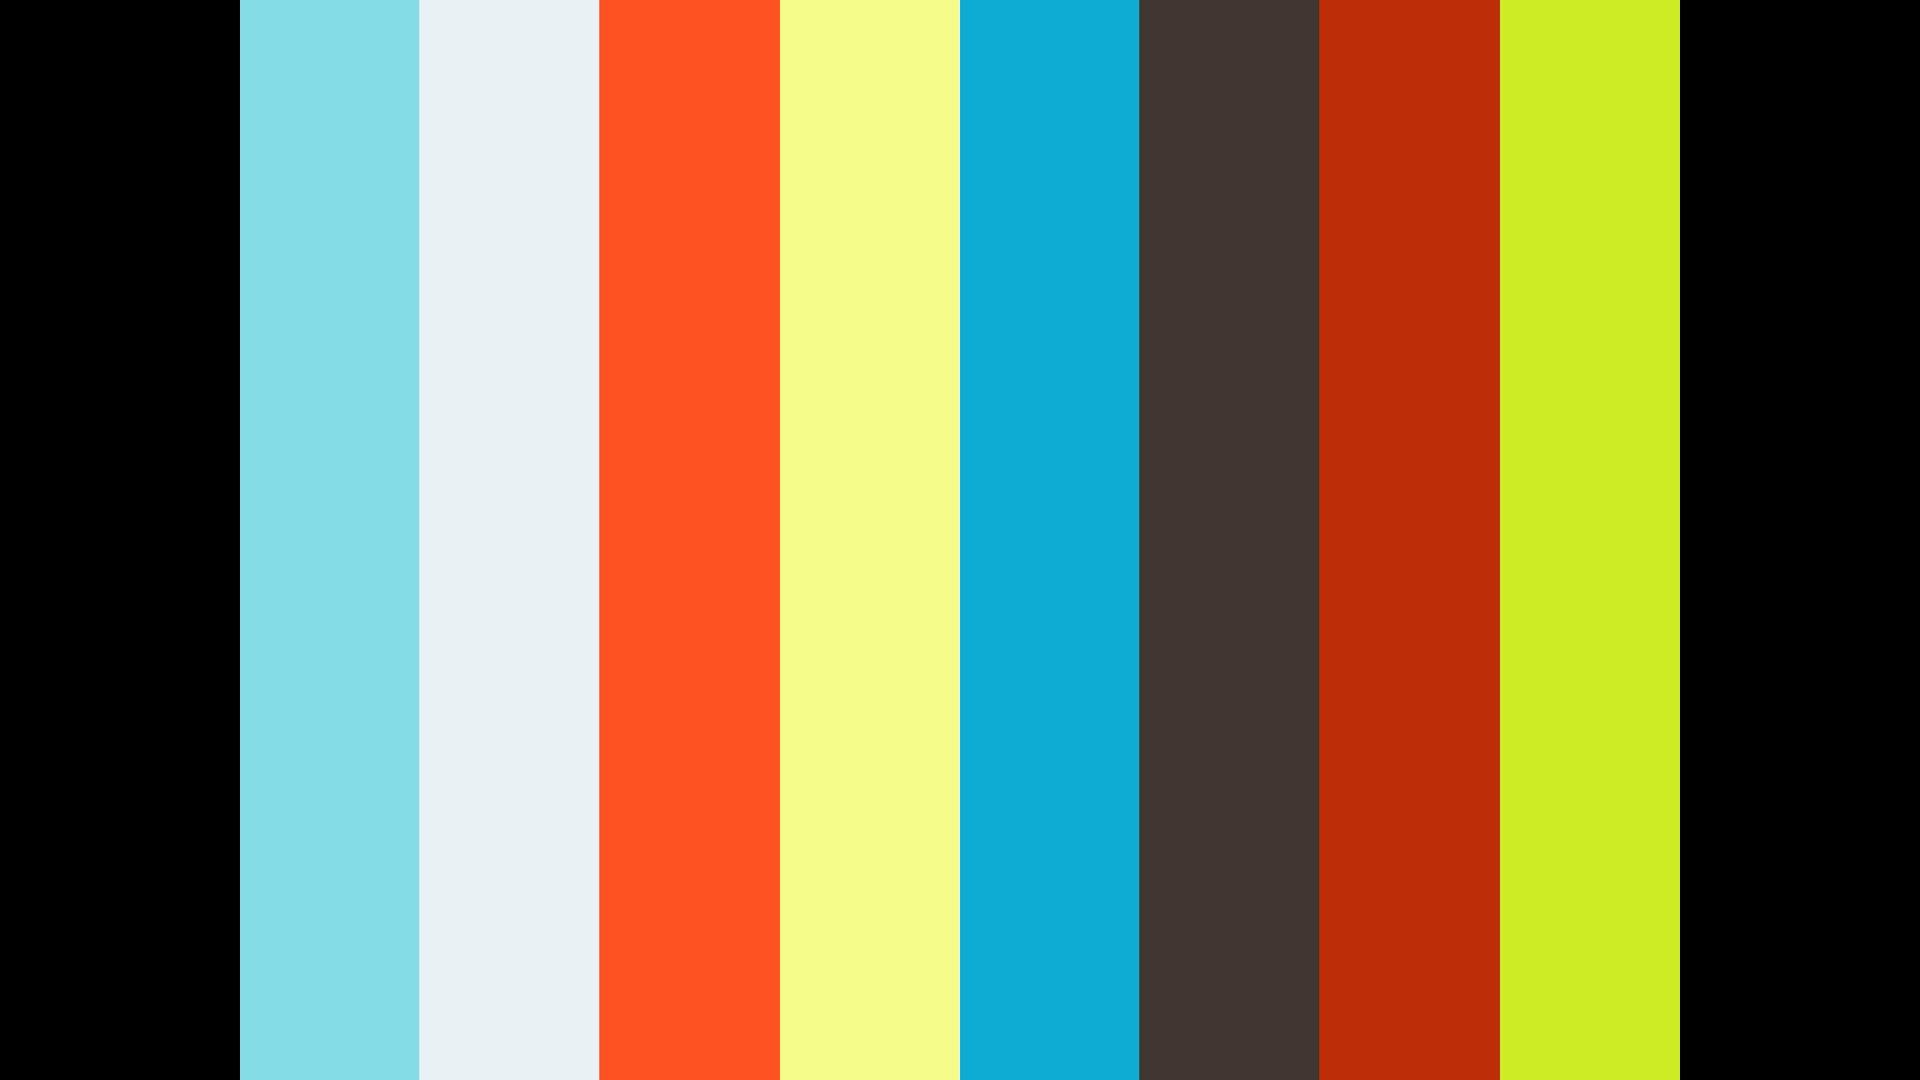 The PsicoRoc Highlight Reel